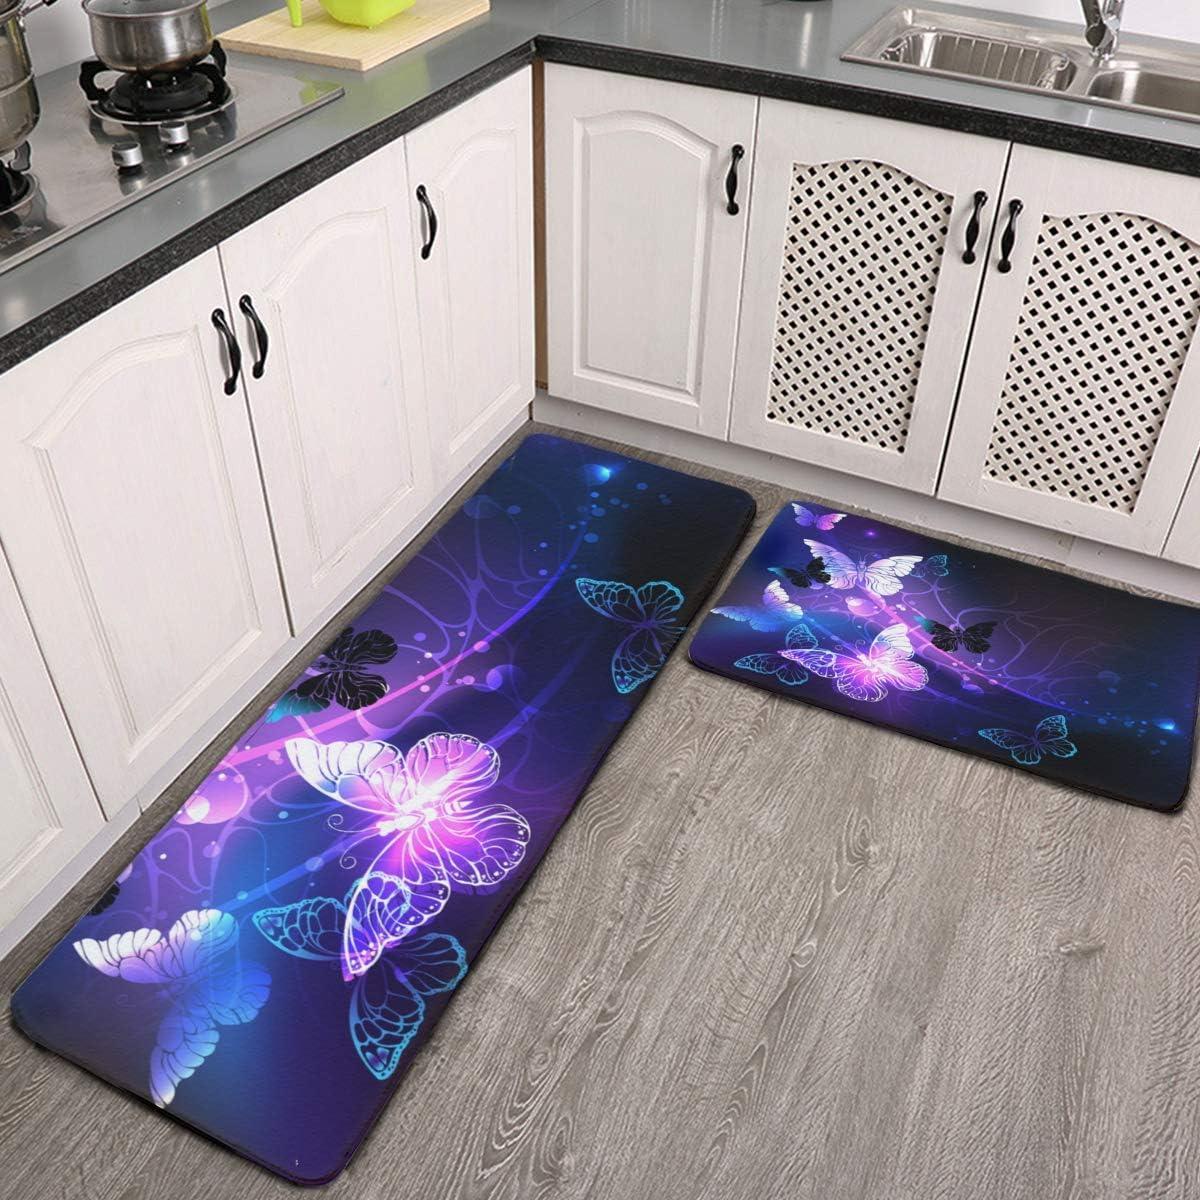 2 Pieces Non Skid Kitchen Rugs Glowing Night Butterflies Purple